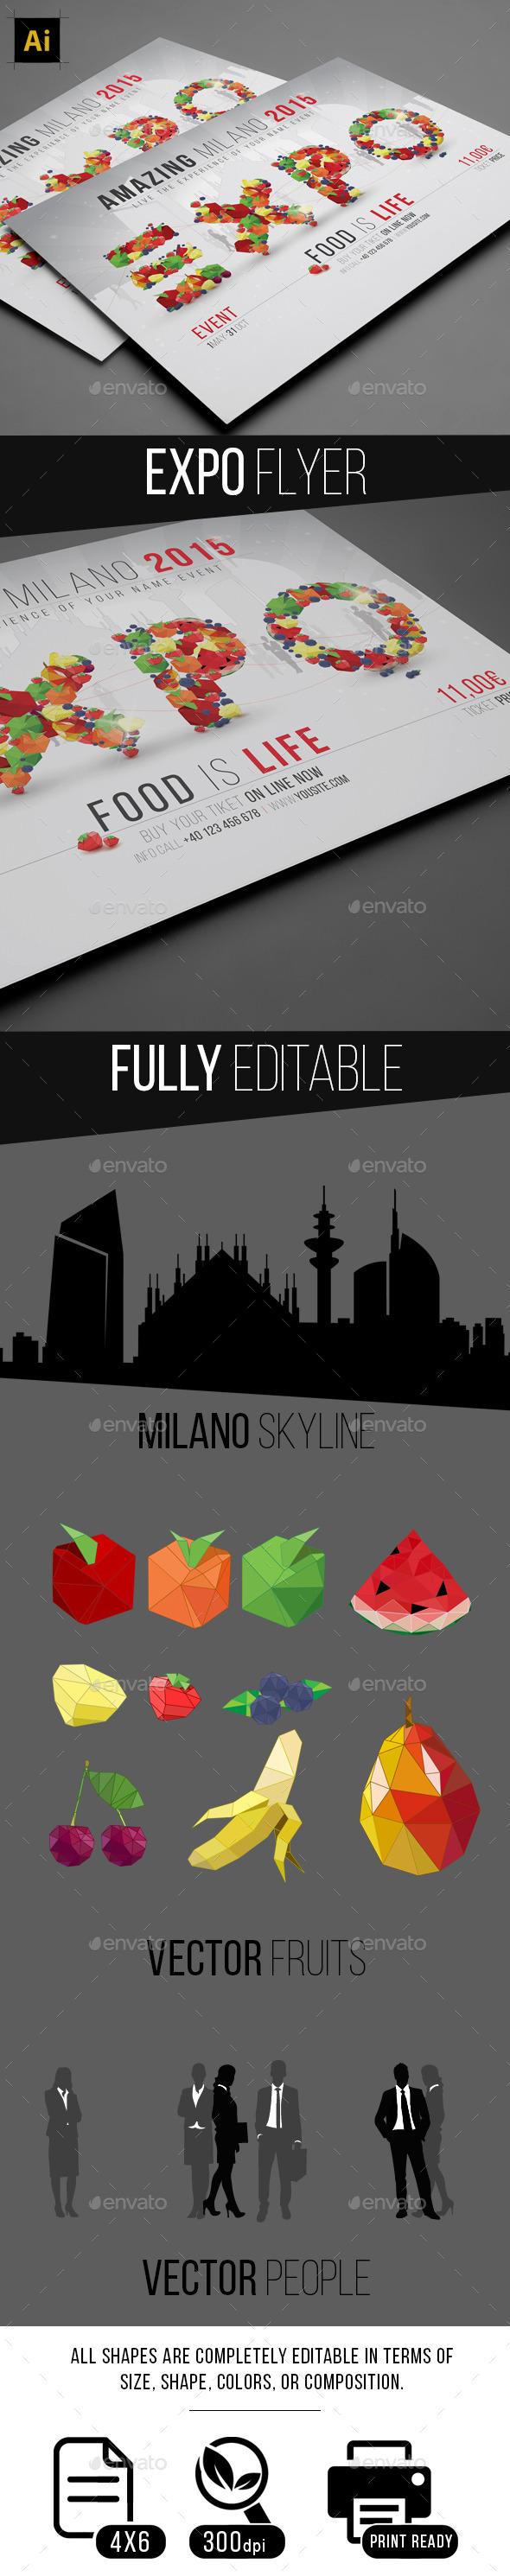 GraphicRiver Expo Flyer 10400141